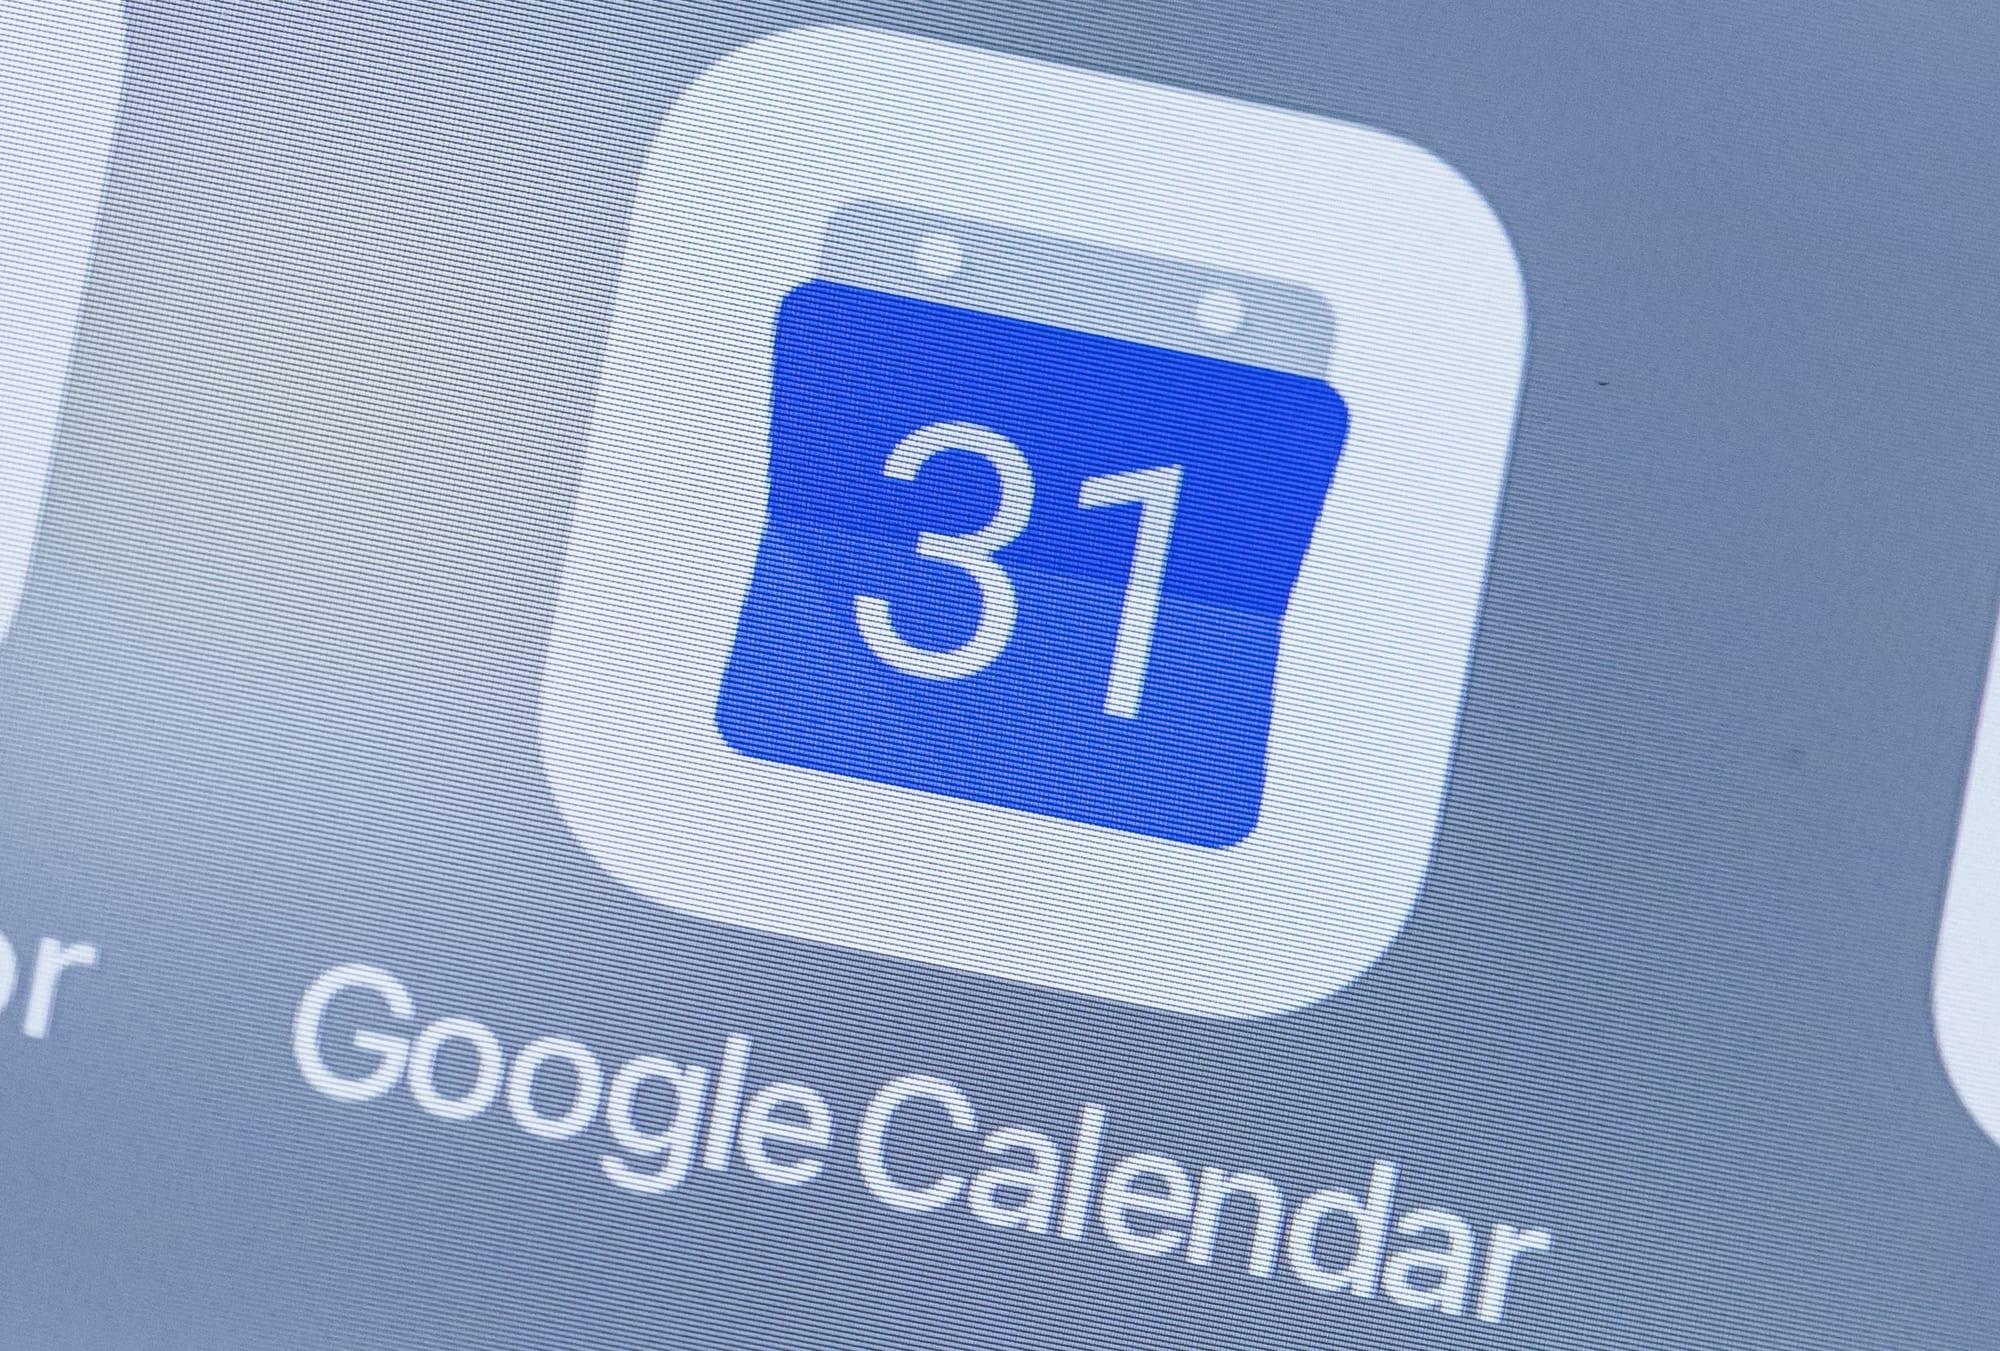 Google Calendar is down, everyone panic!